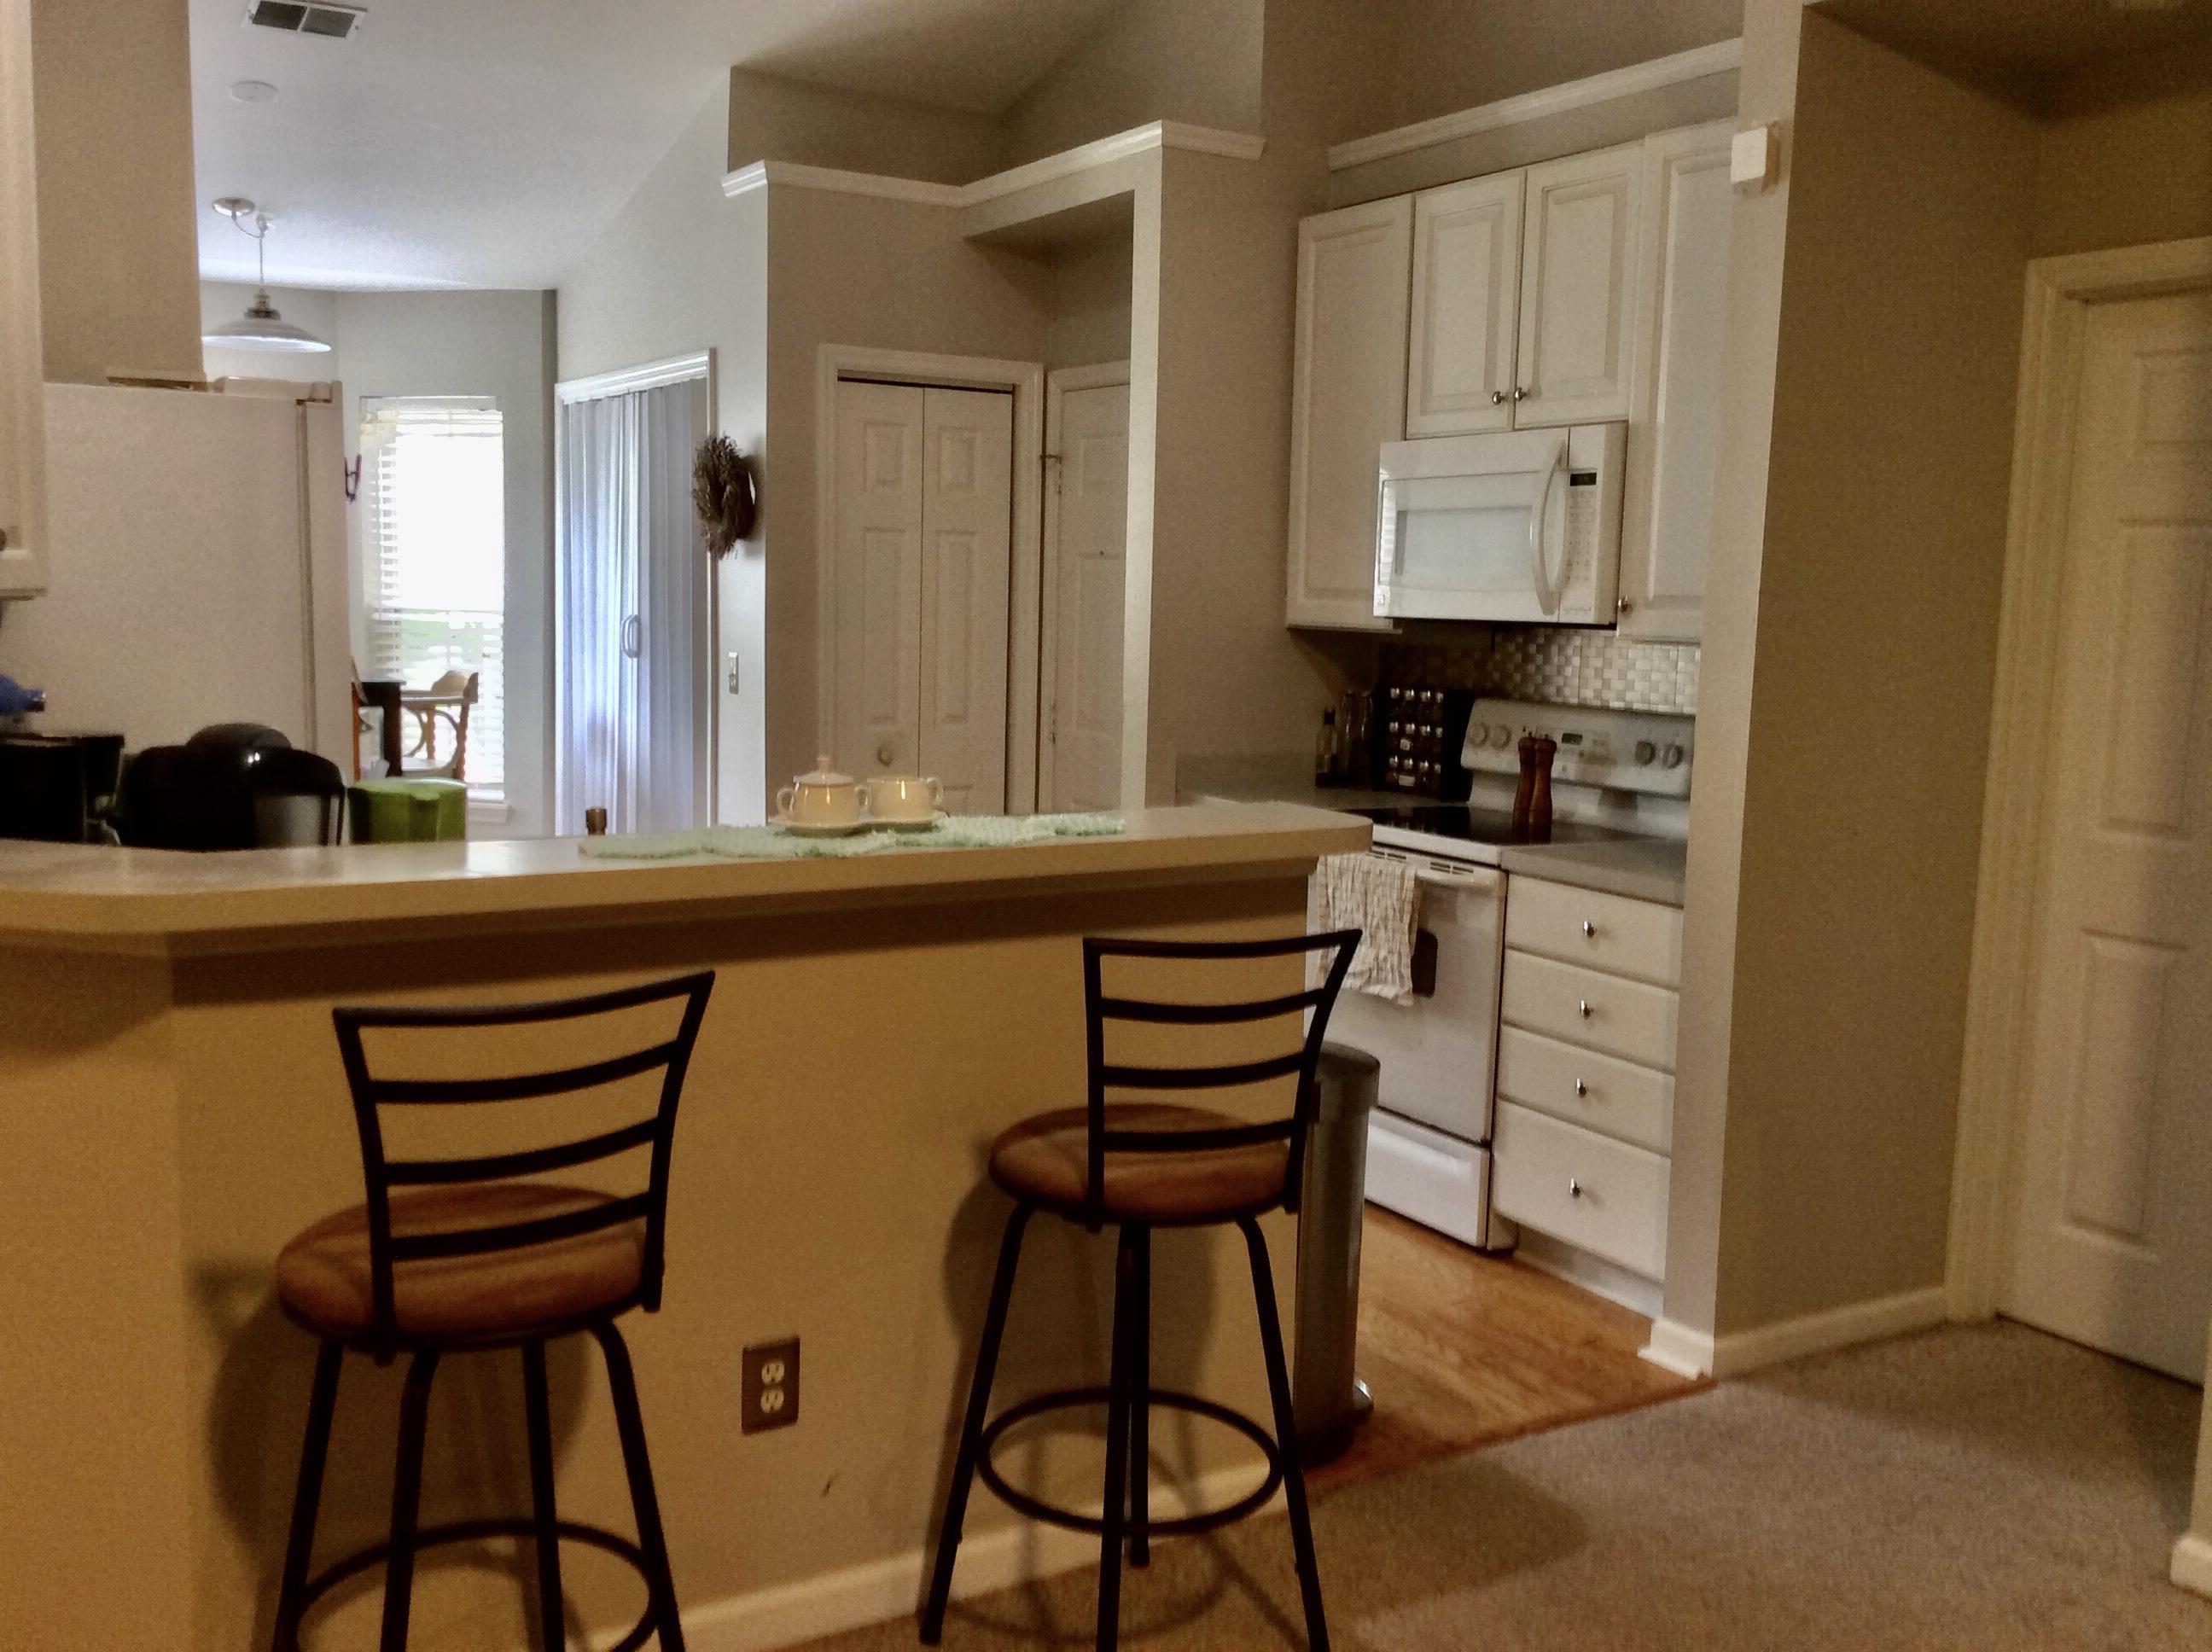 Planters Pointe Homes For Sale - 2616 Turben, Mount Pleasant, SC - 3